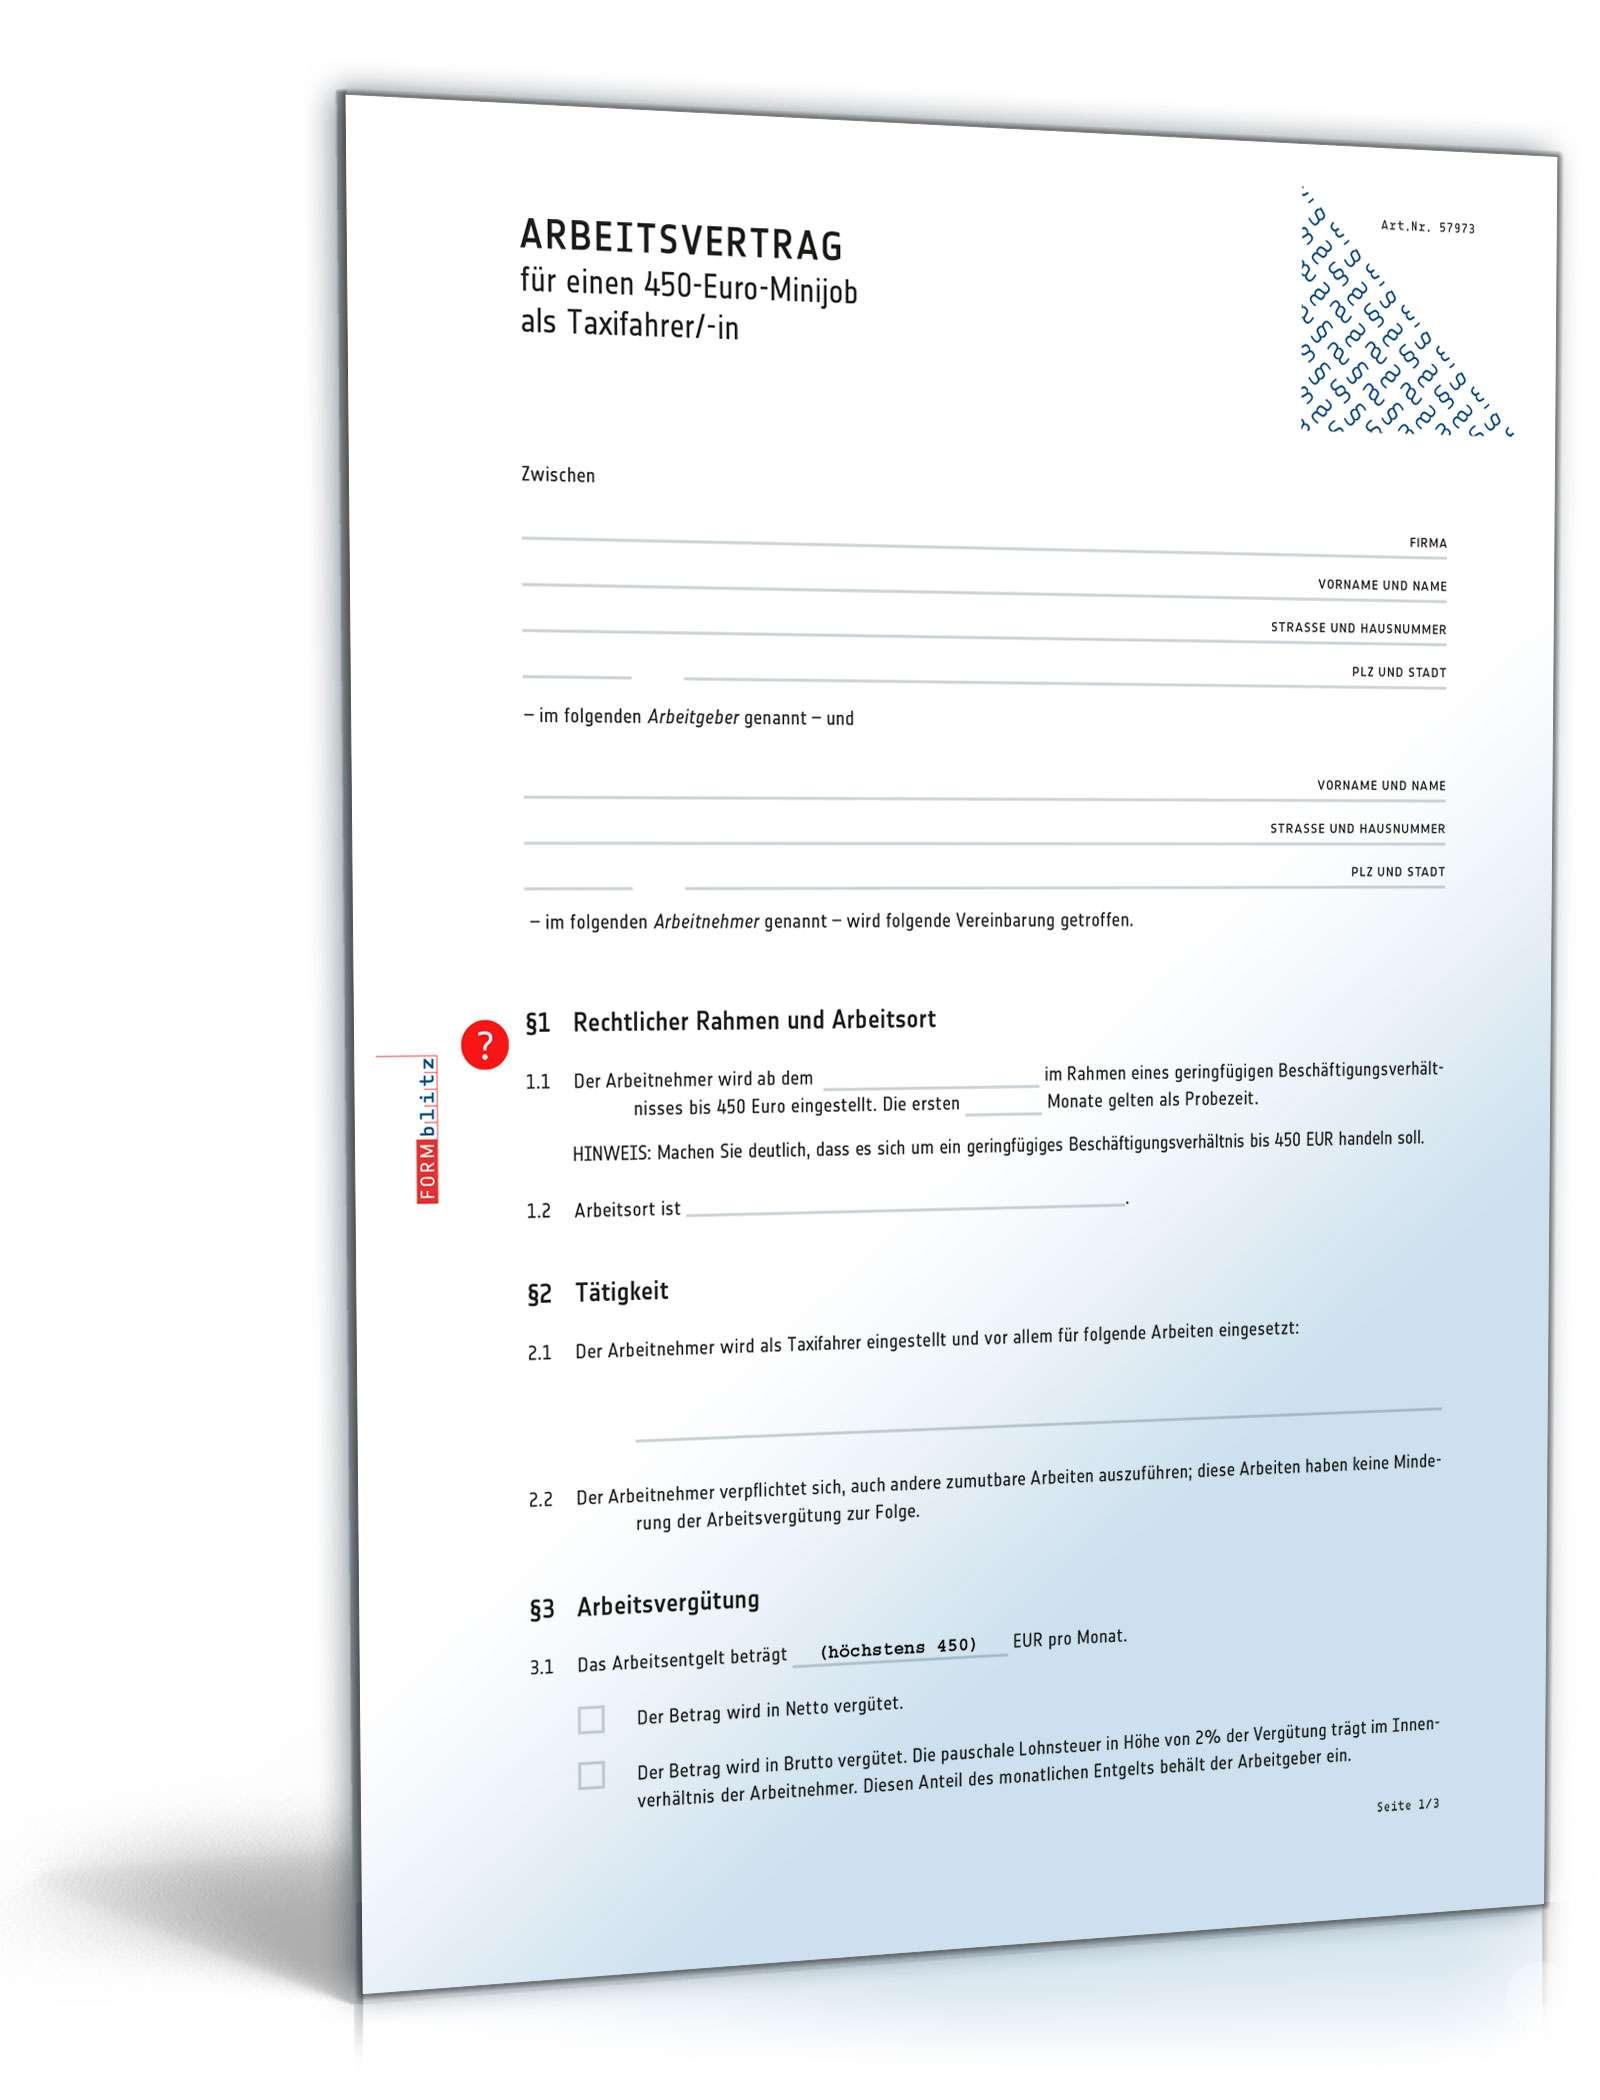 Arbeitsvertrag Minijob Taxifahrer Muster Zum Download